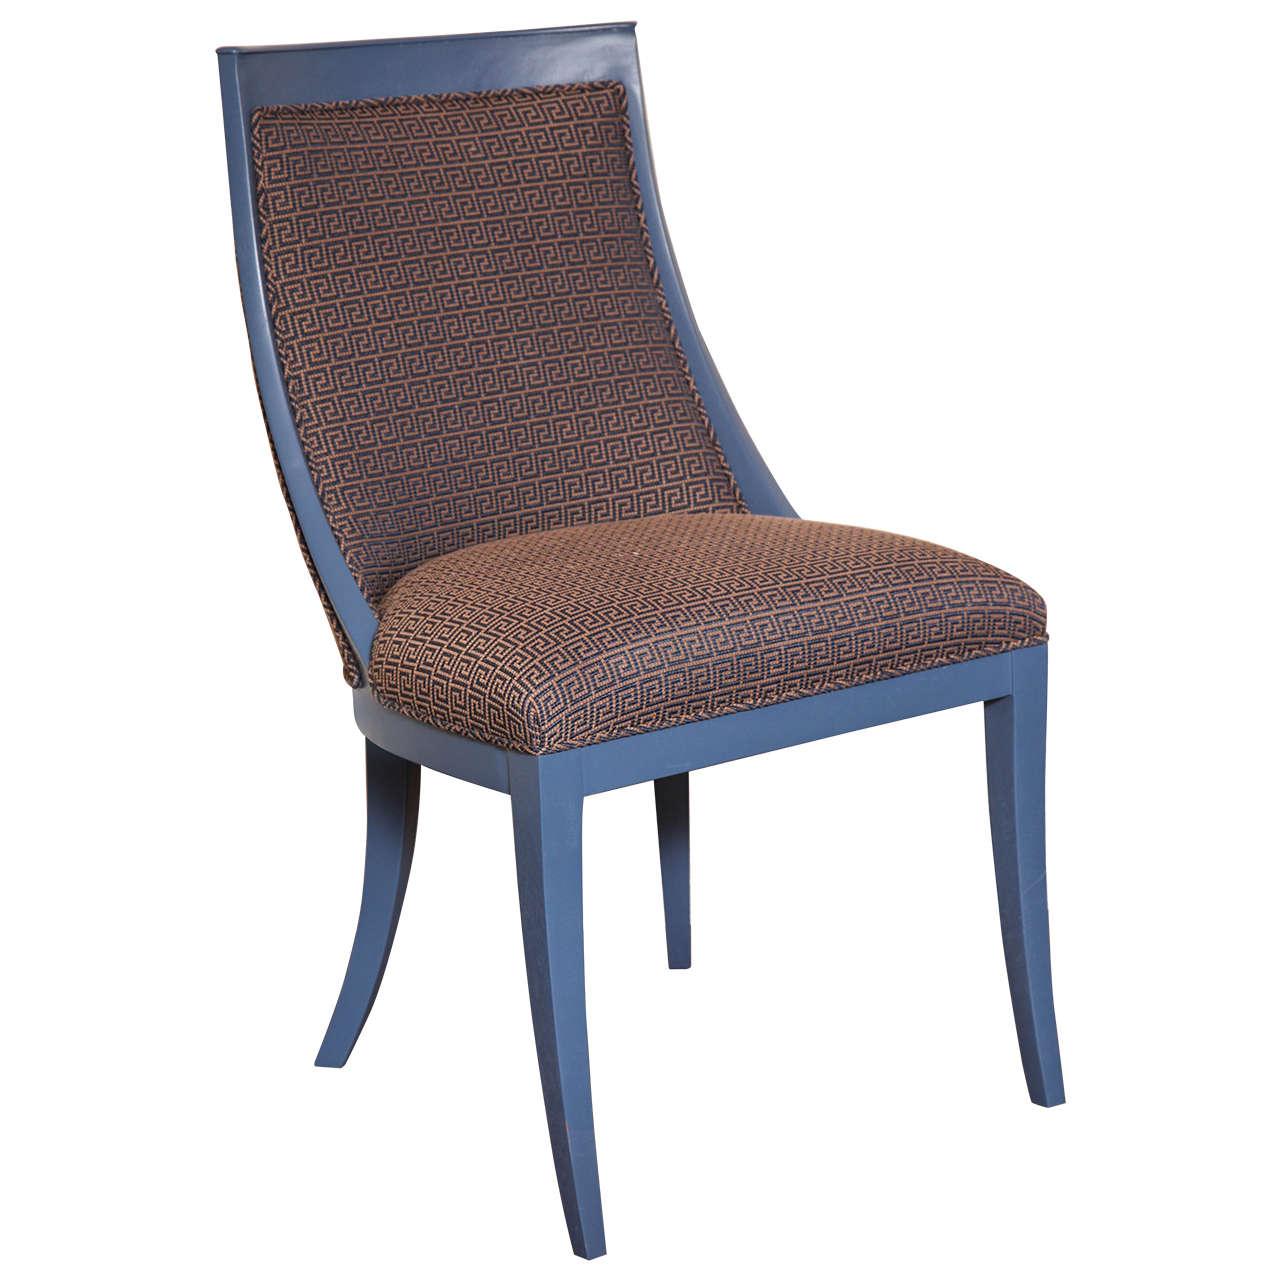 Greek Key Art Deco Chair For Sale